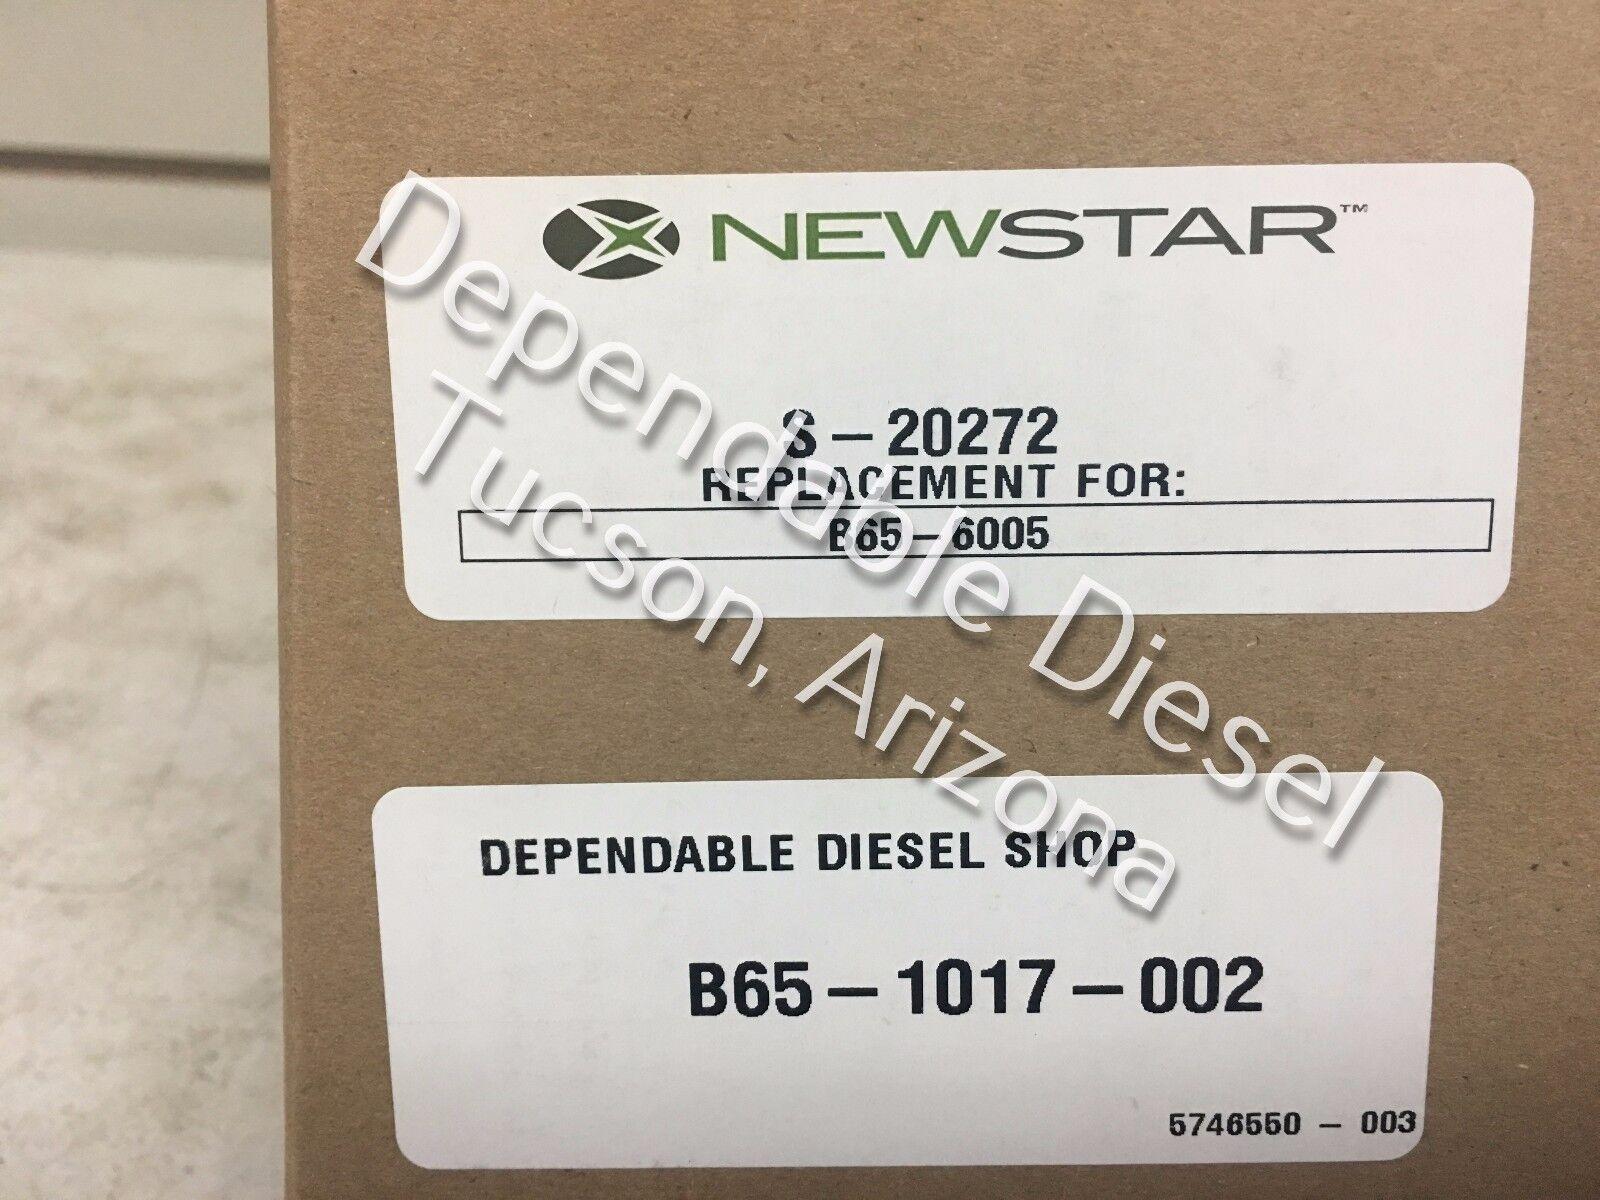 AG130 Leaf Spring Eye Bushing Pin S/&S # S-20272 Ref.# Kenworth B65-6005 MRB-328